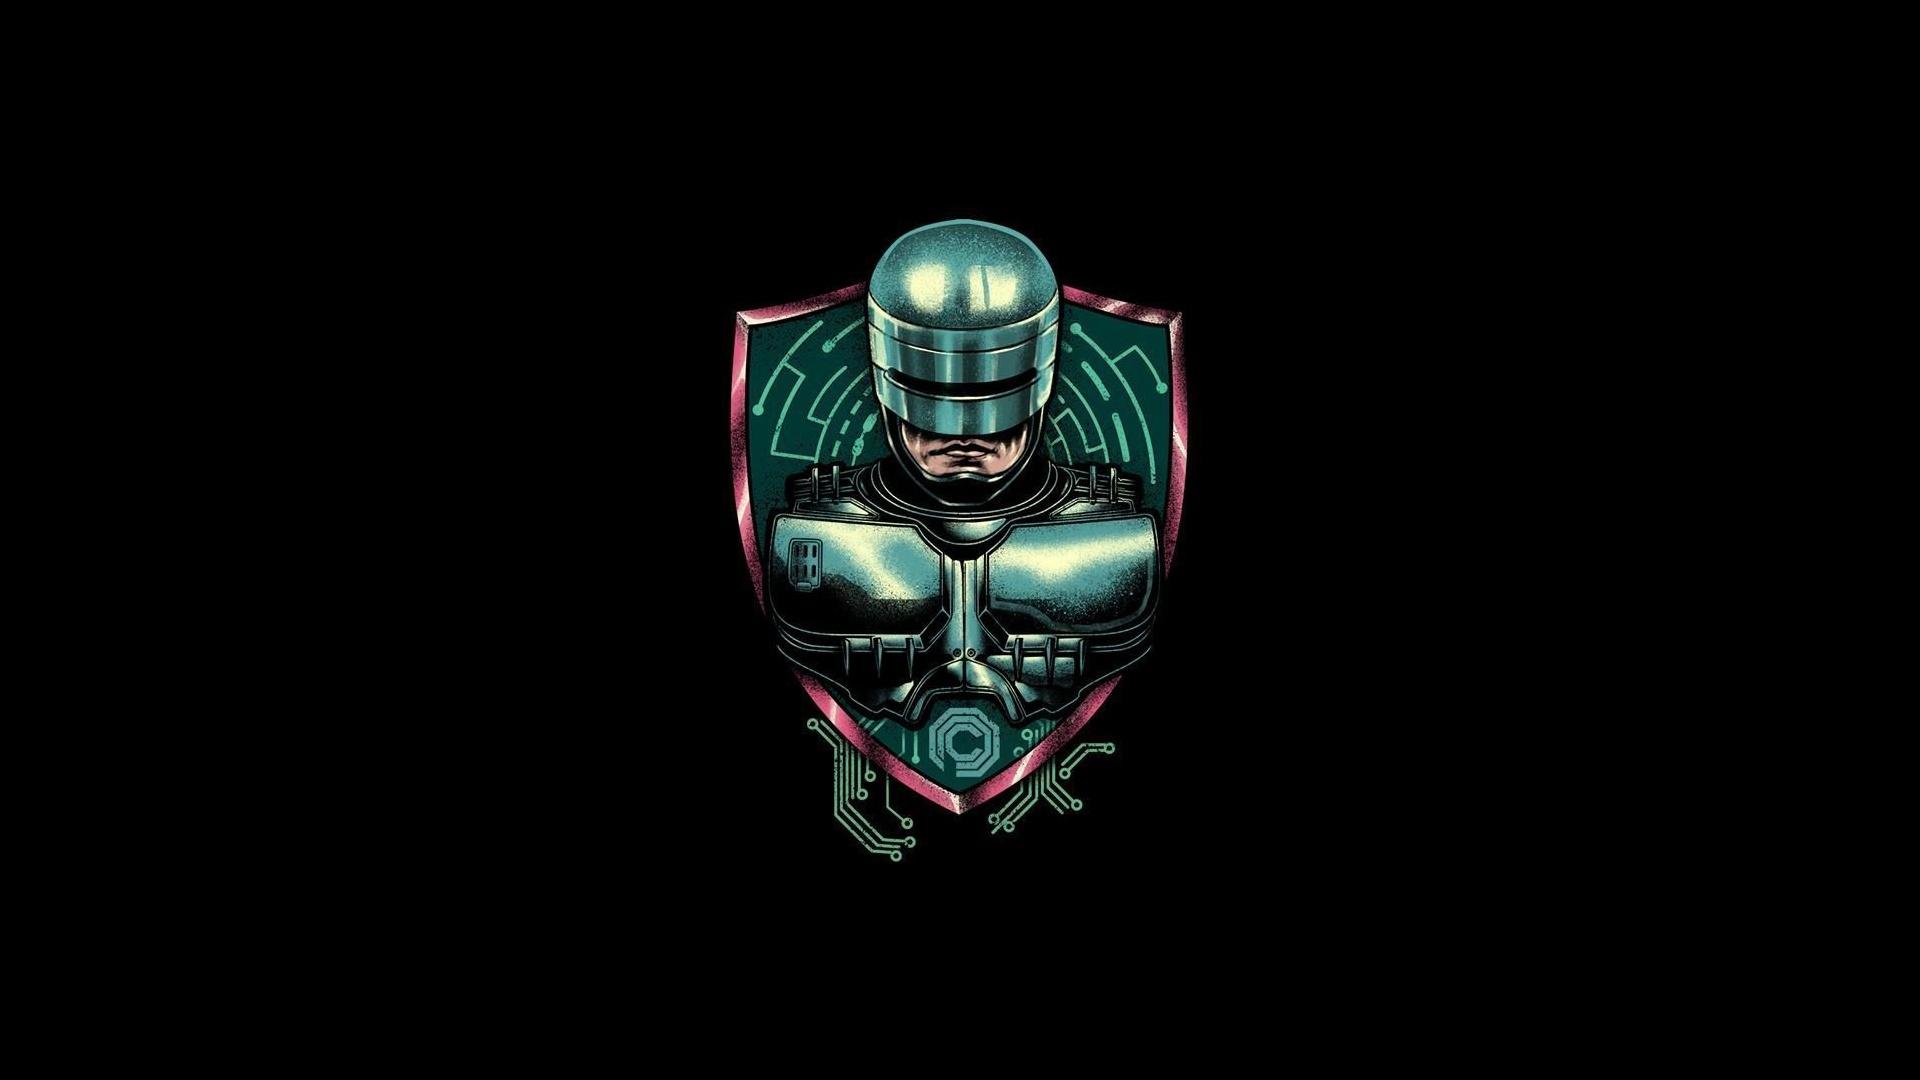 General 1920x1080 movies artwork minimalism cyborg RoboCop simple background